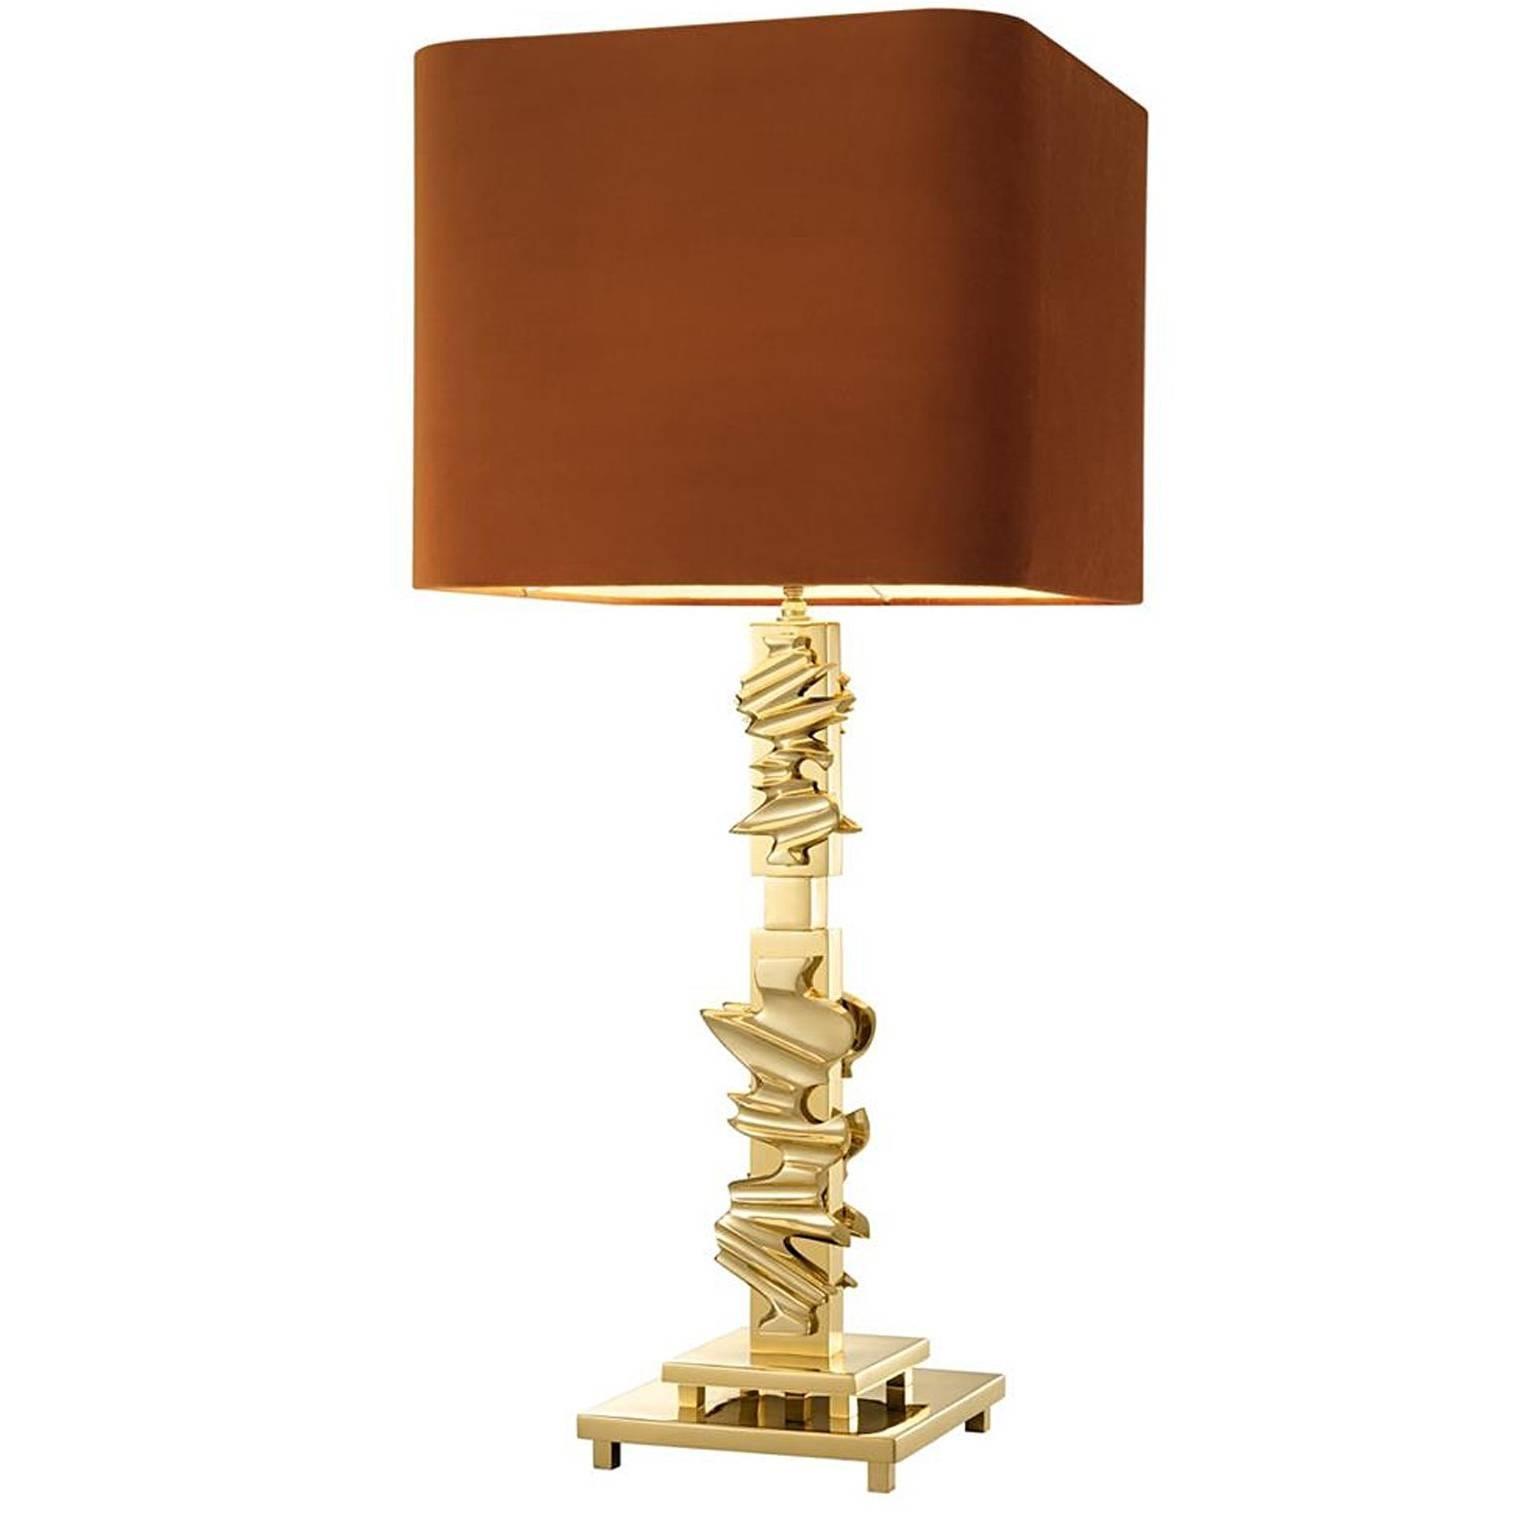 Braza Table Lamp in Brass or Nickel Finish